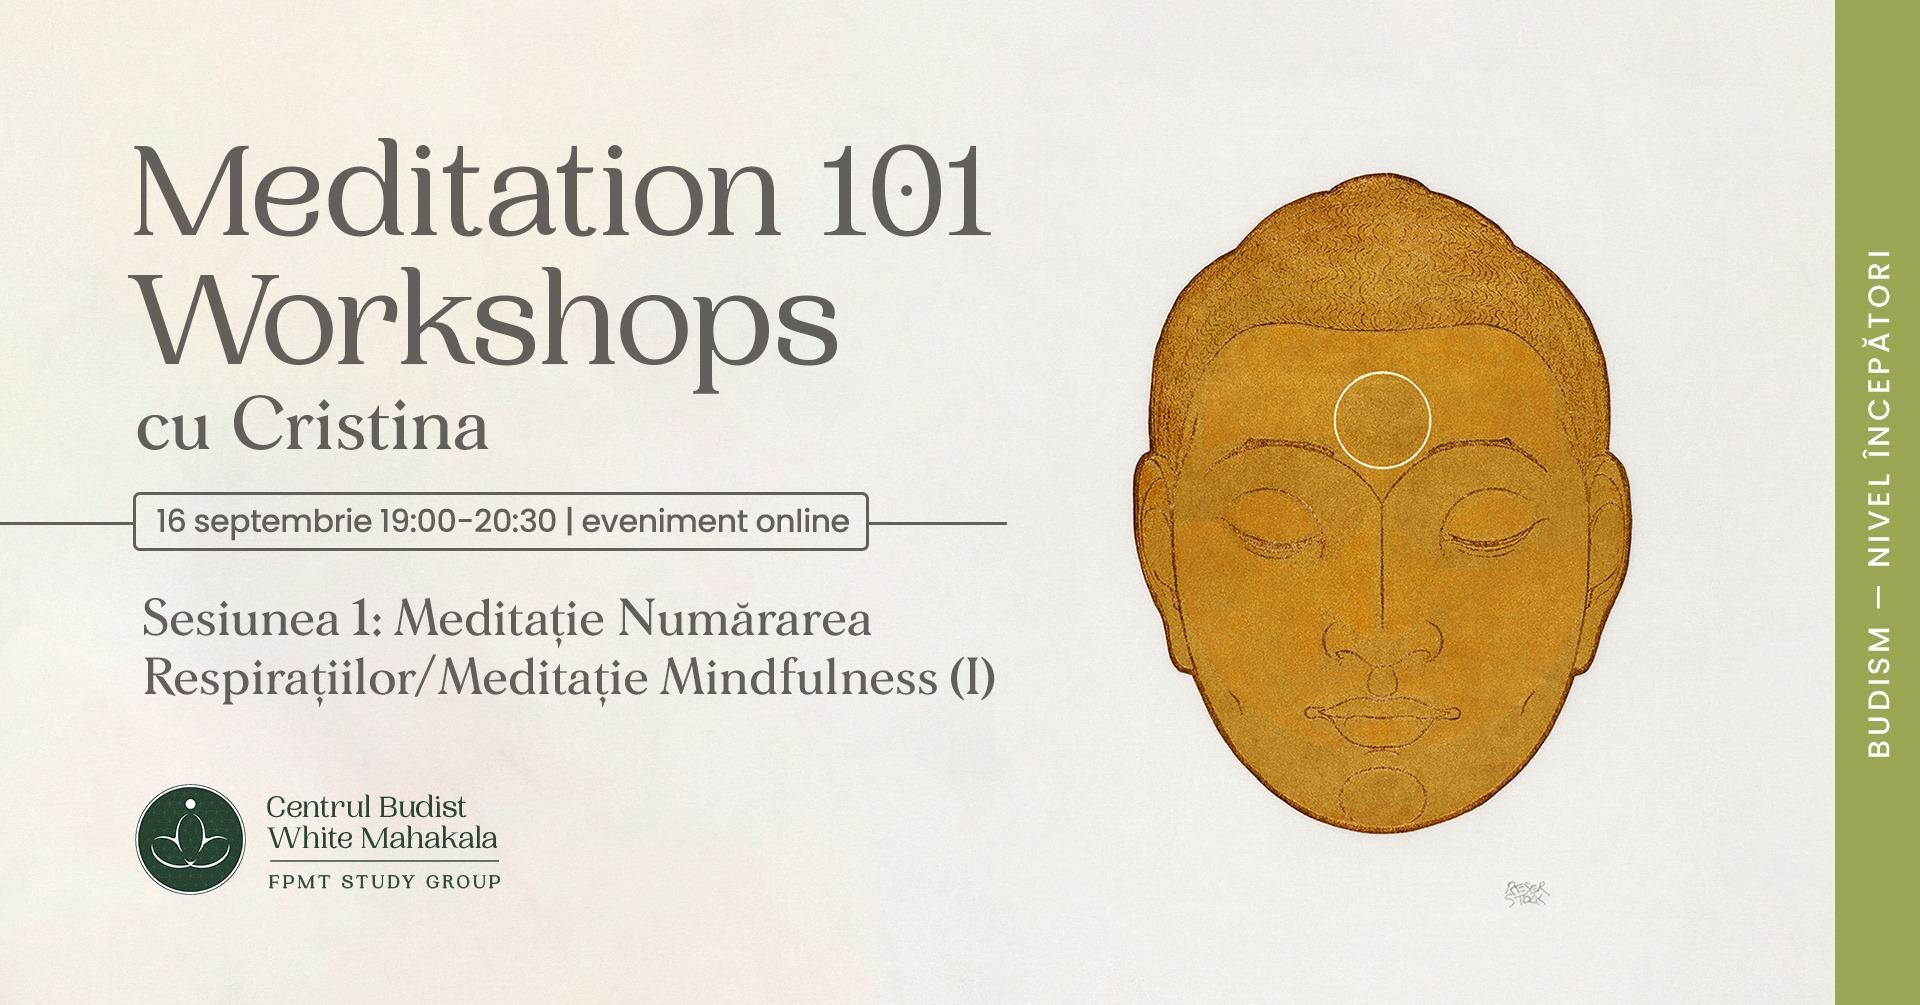 MEDITATION 101- Workshops Sesiunea 1: Meditatie Numararea Respiratiilor/Meditatie Mindfulness (I)